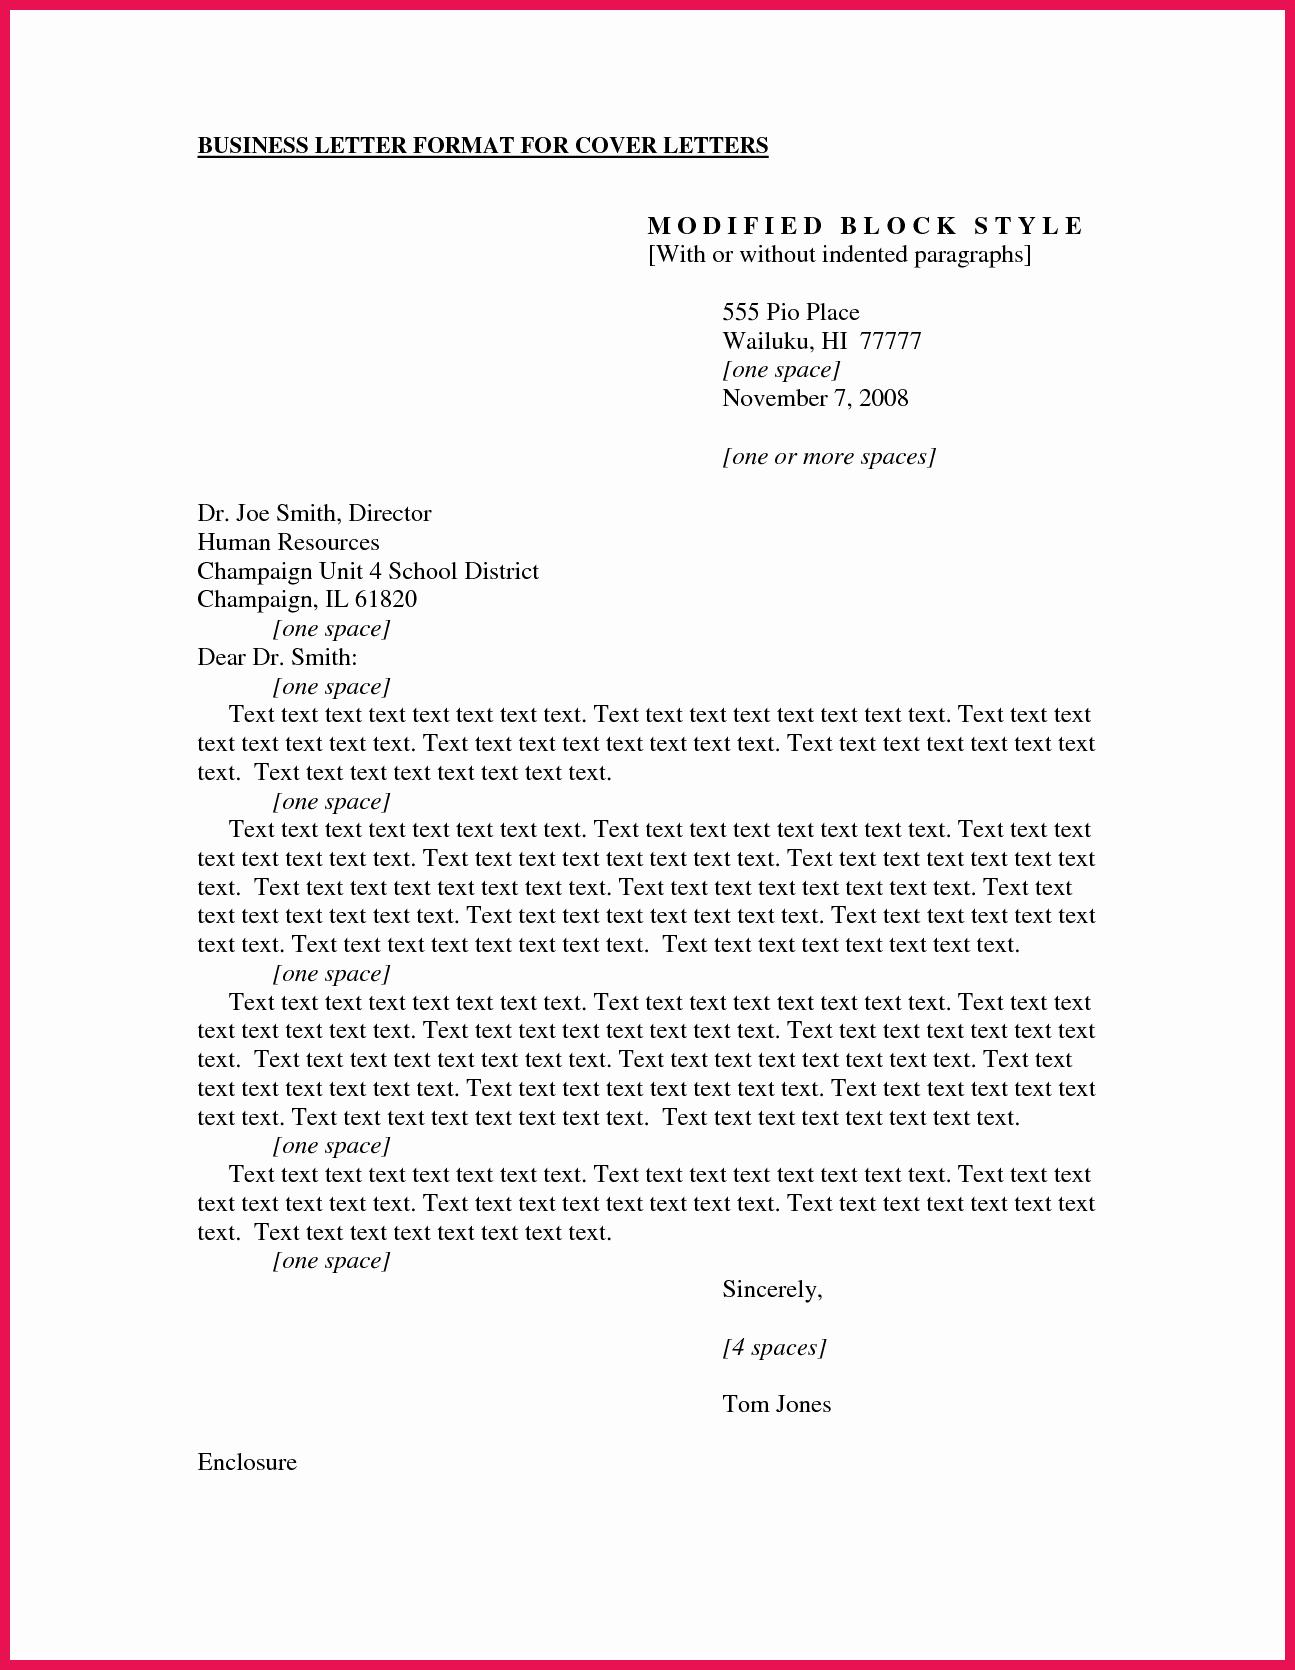 Purdue Owl Letter format Elegant Business Cover Letter format